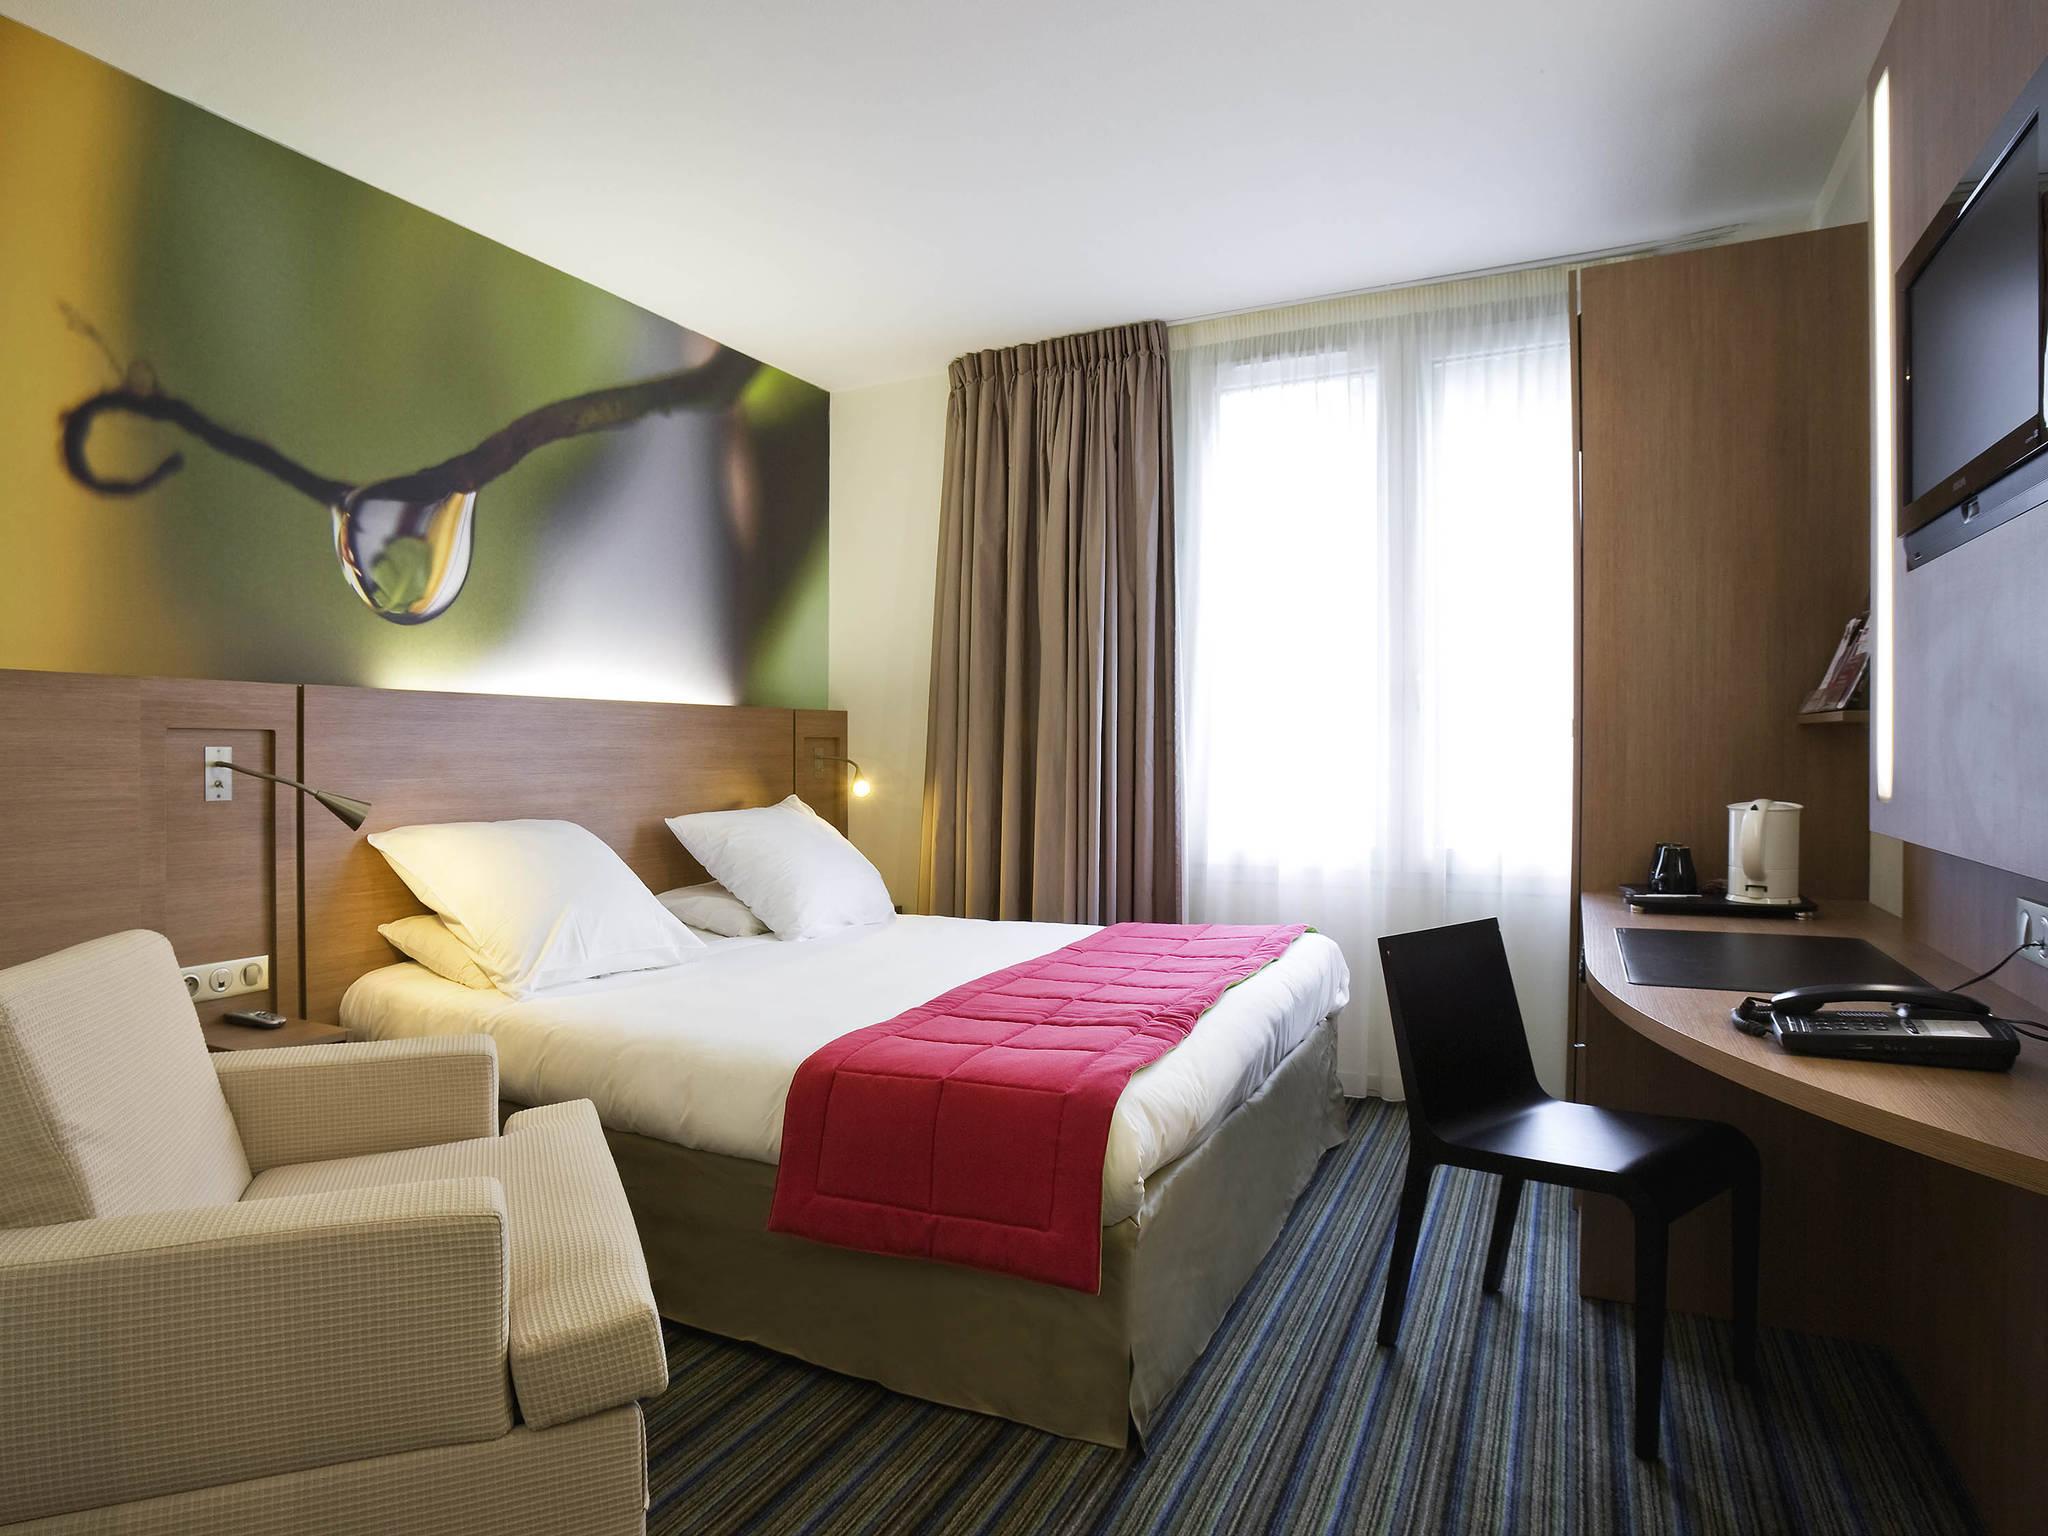 Hotel em quimper hotel mercure quimper centre for Hotels quimper